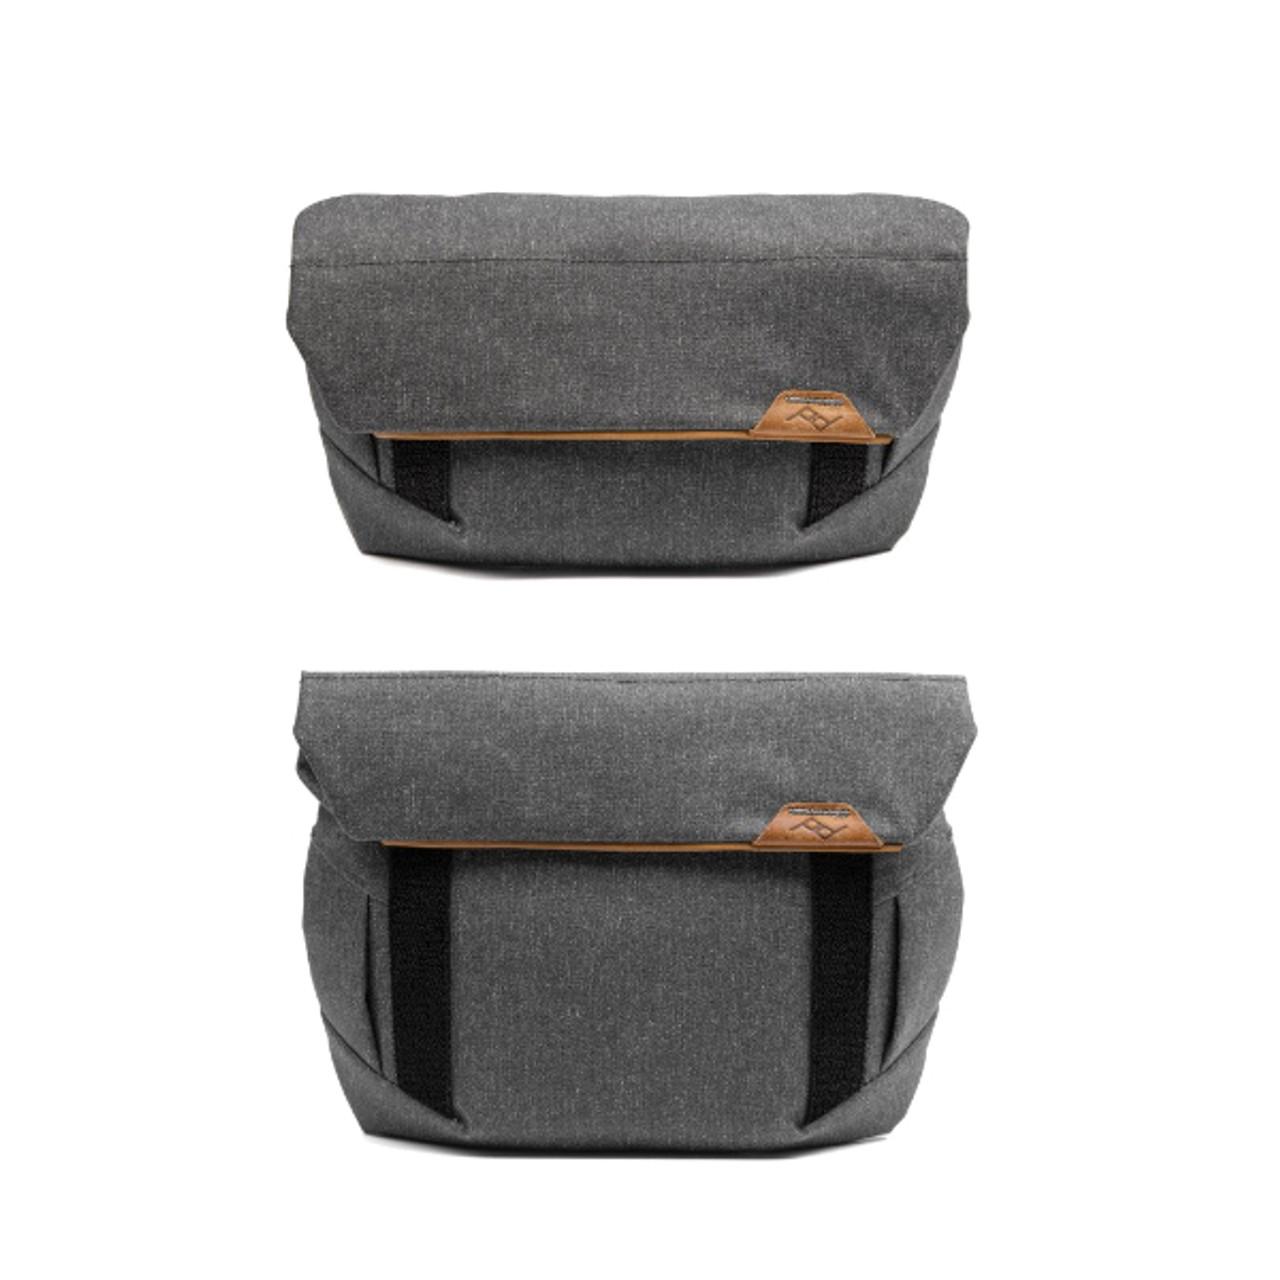 Peak Design Field Pouch v2 - Charcoal